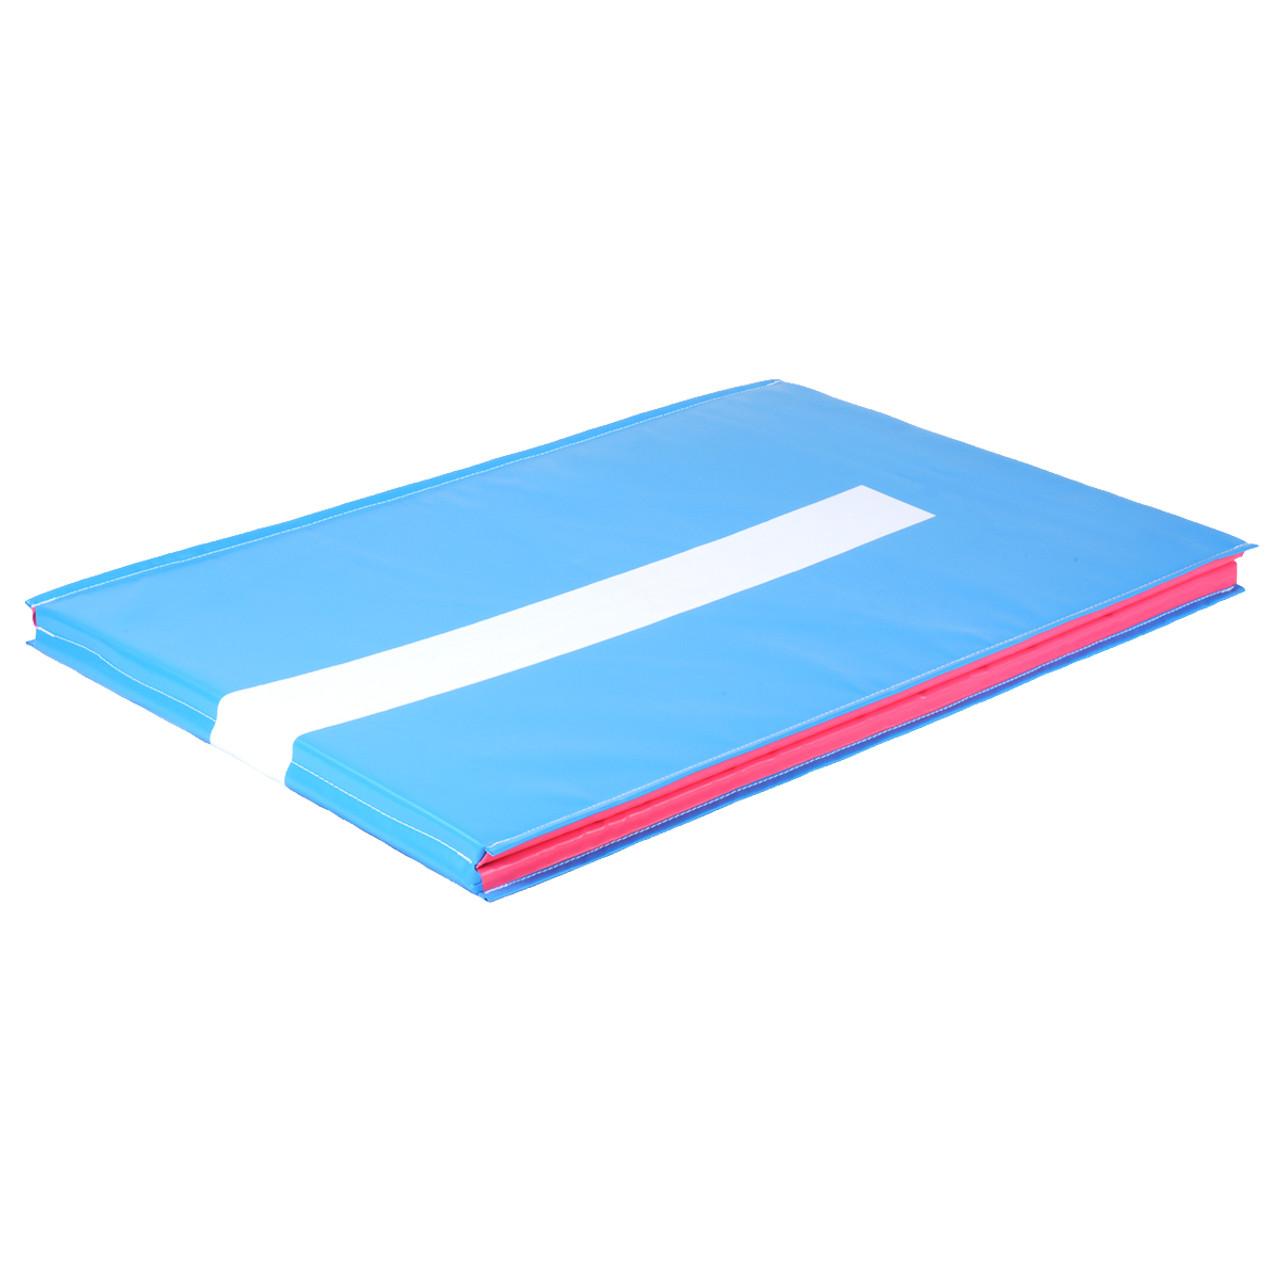 x gymnastic movement gymnastics mats first workout singapore gym mat flooring foldable